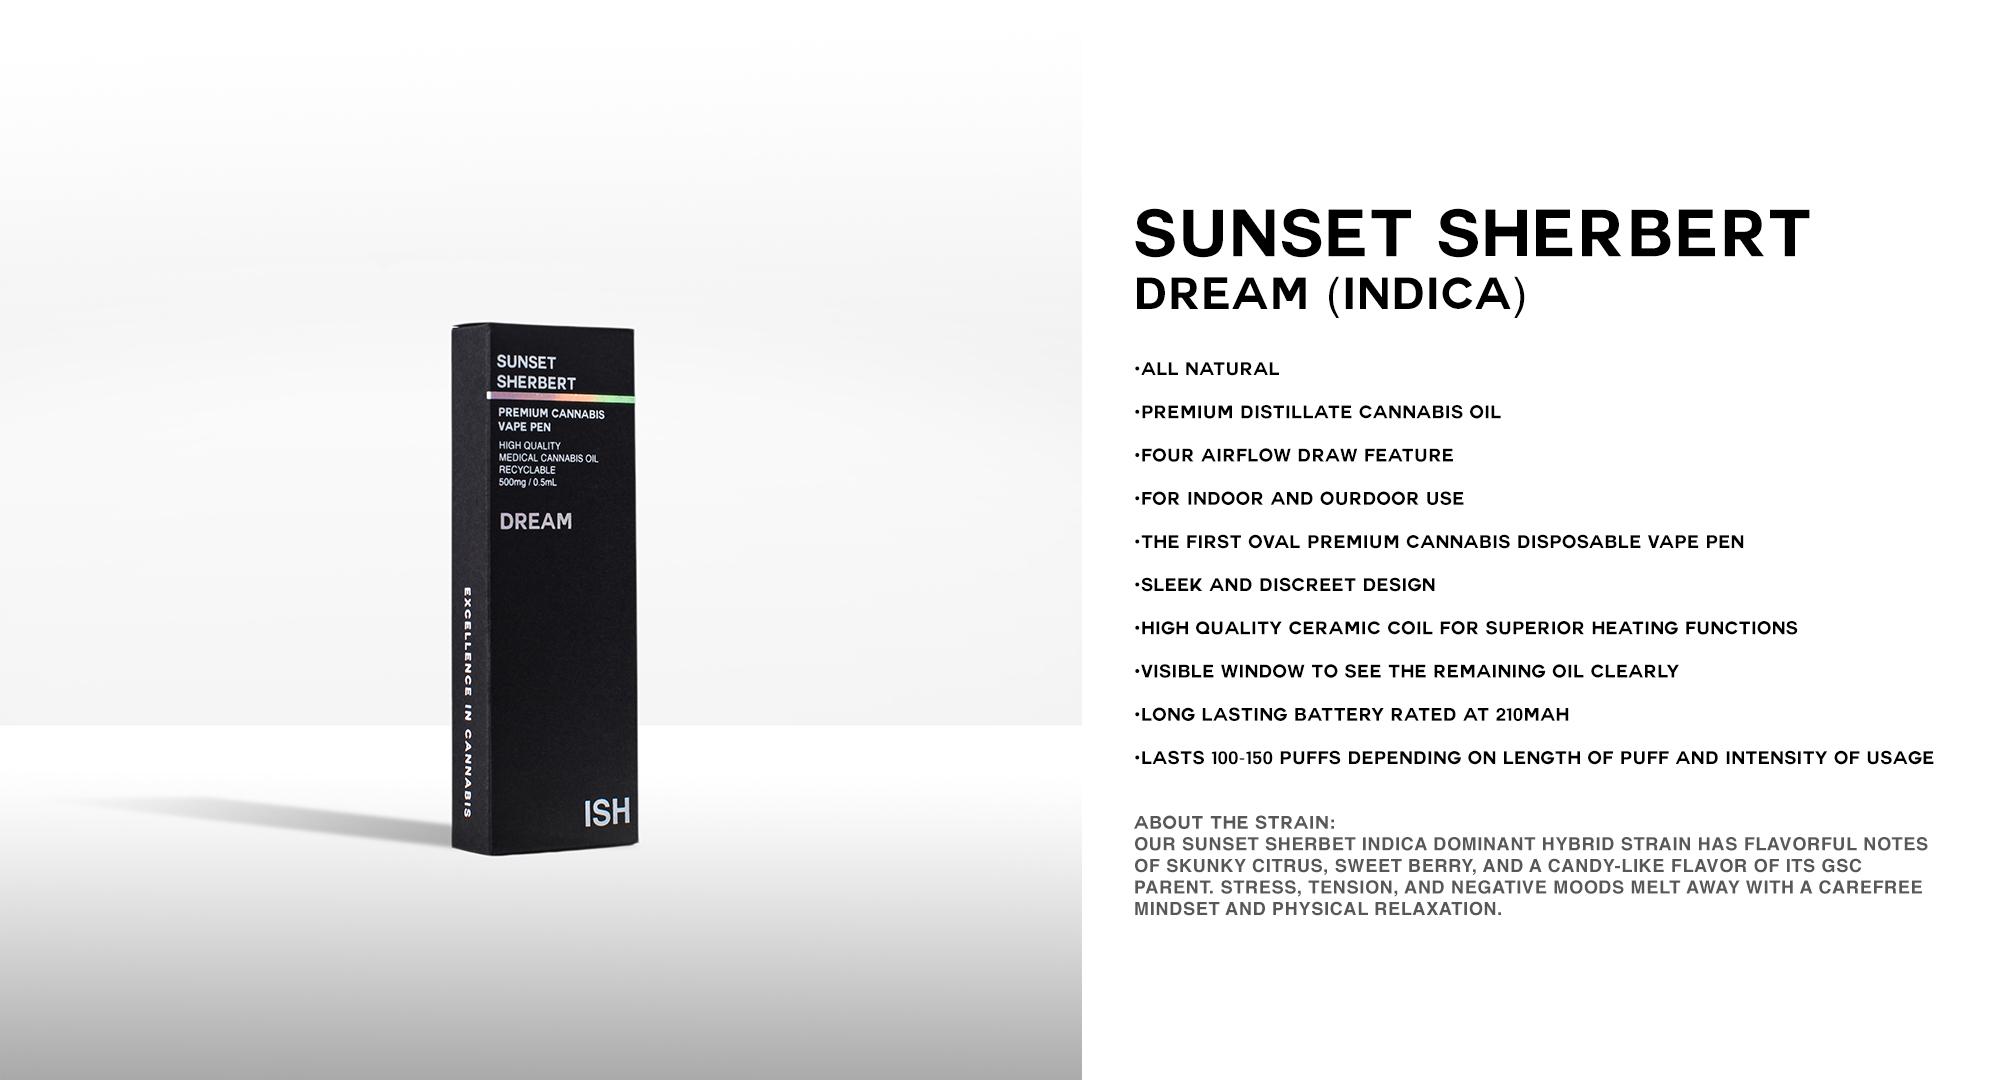 SUNSET SHERBERT (INDICA)